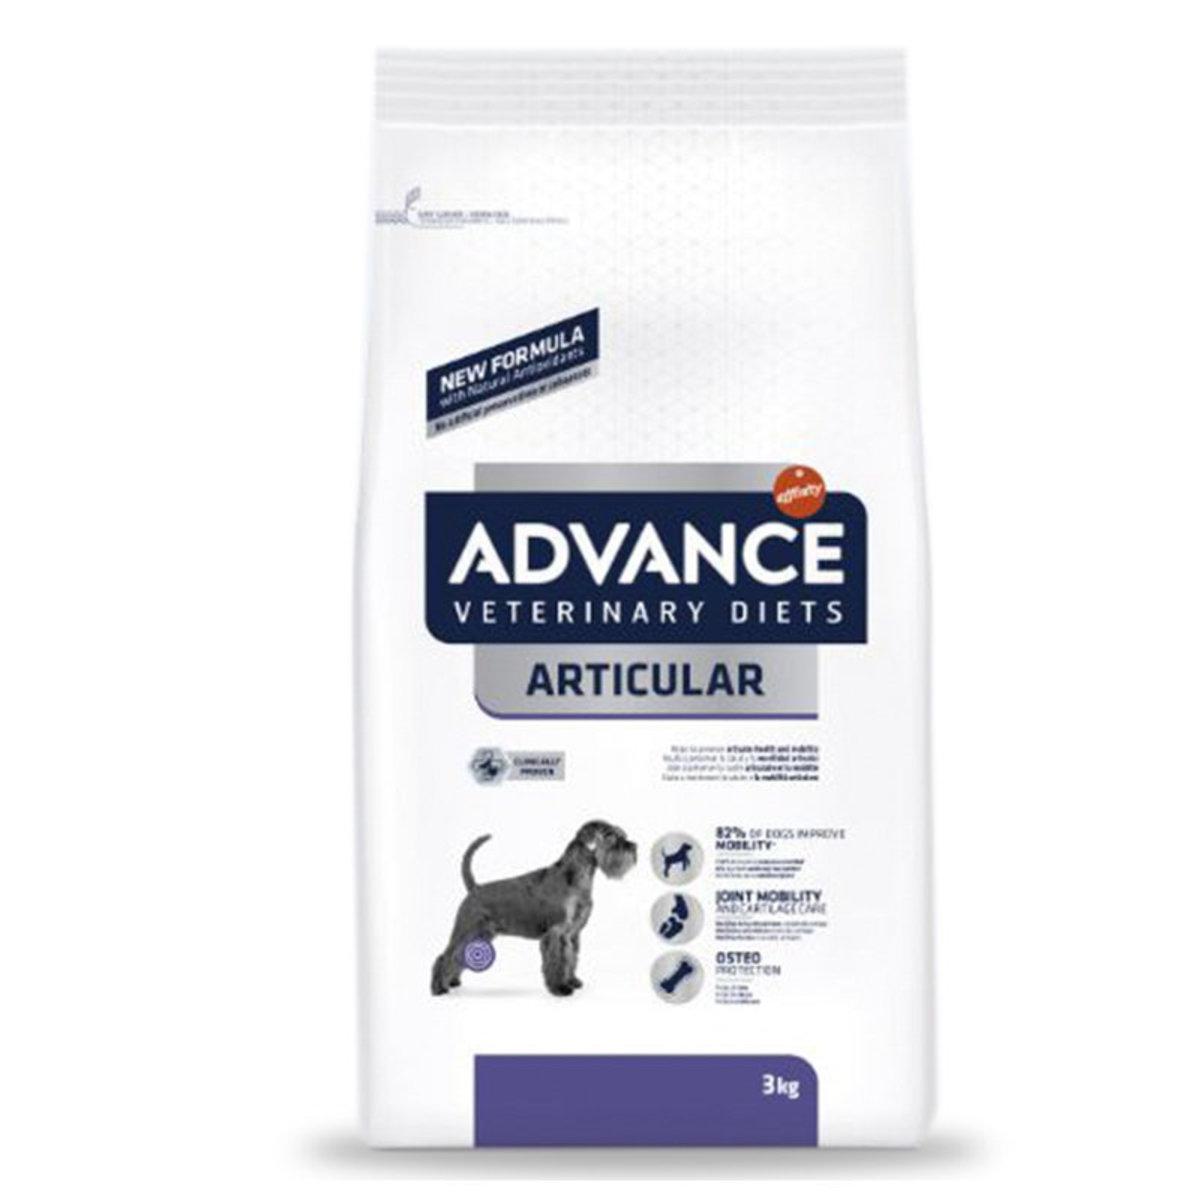 Advance Veterinary Diets Articular